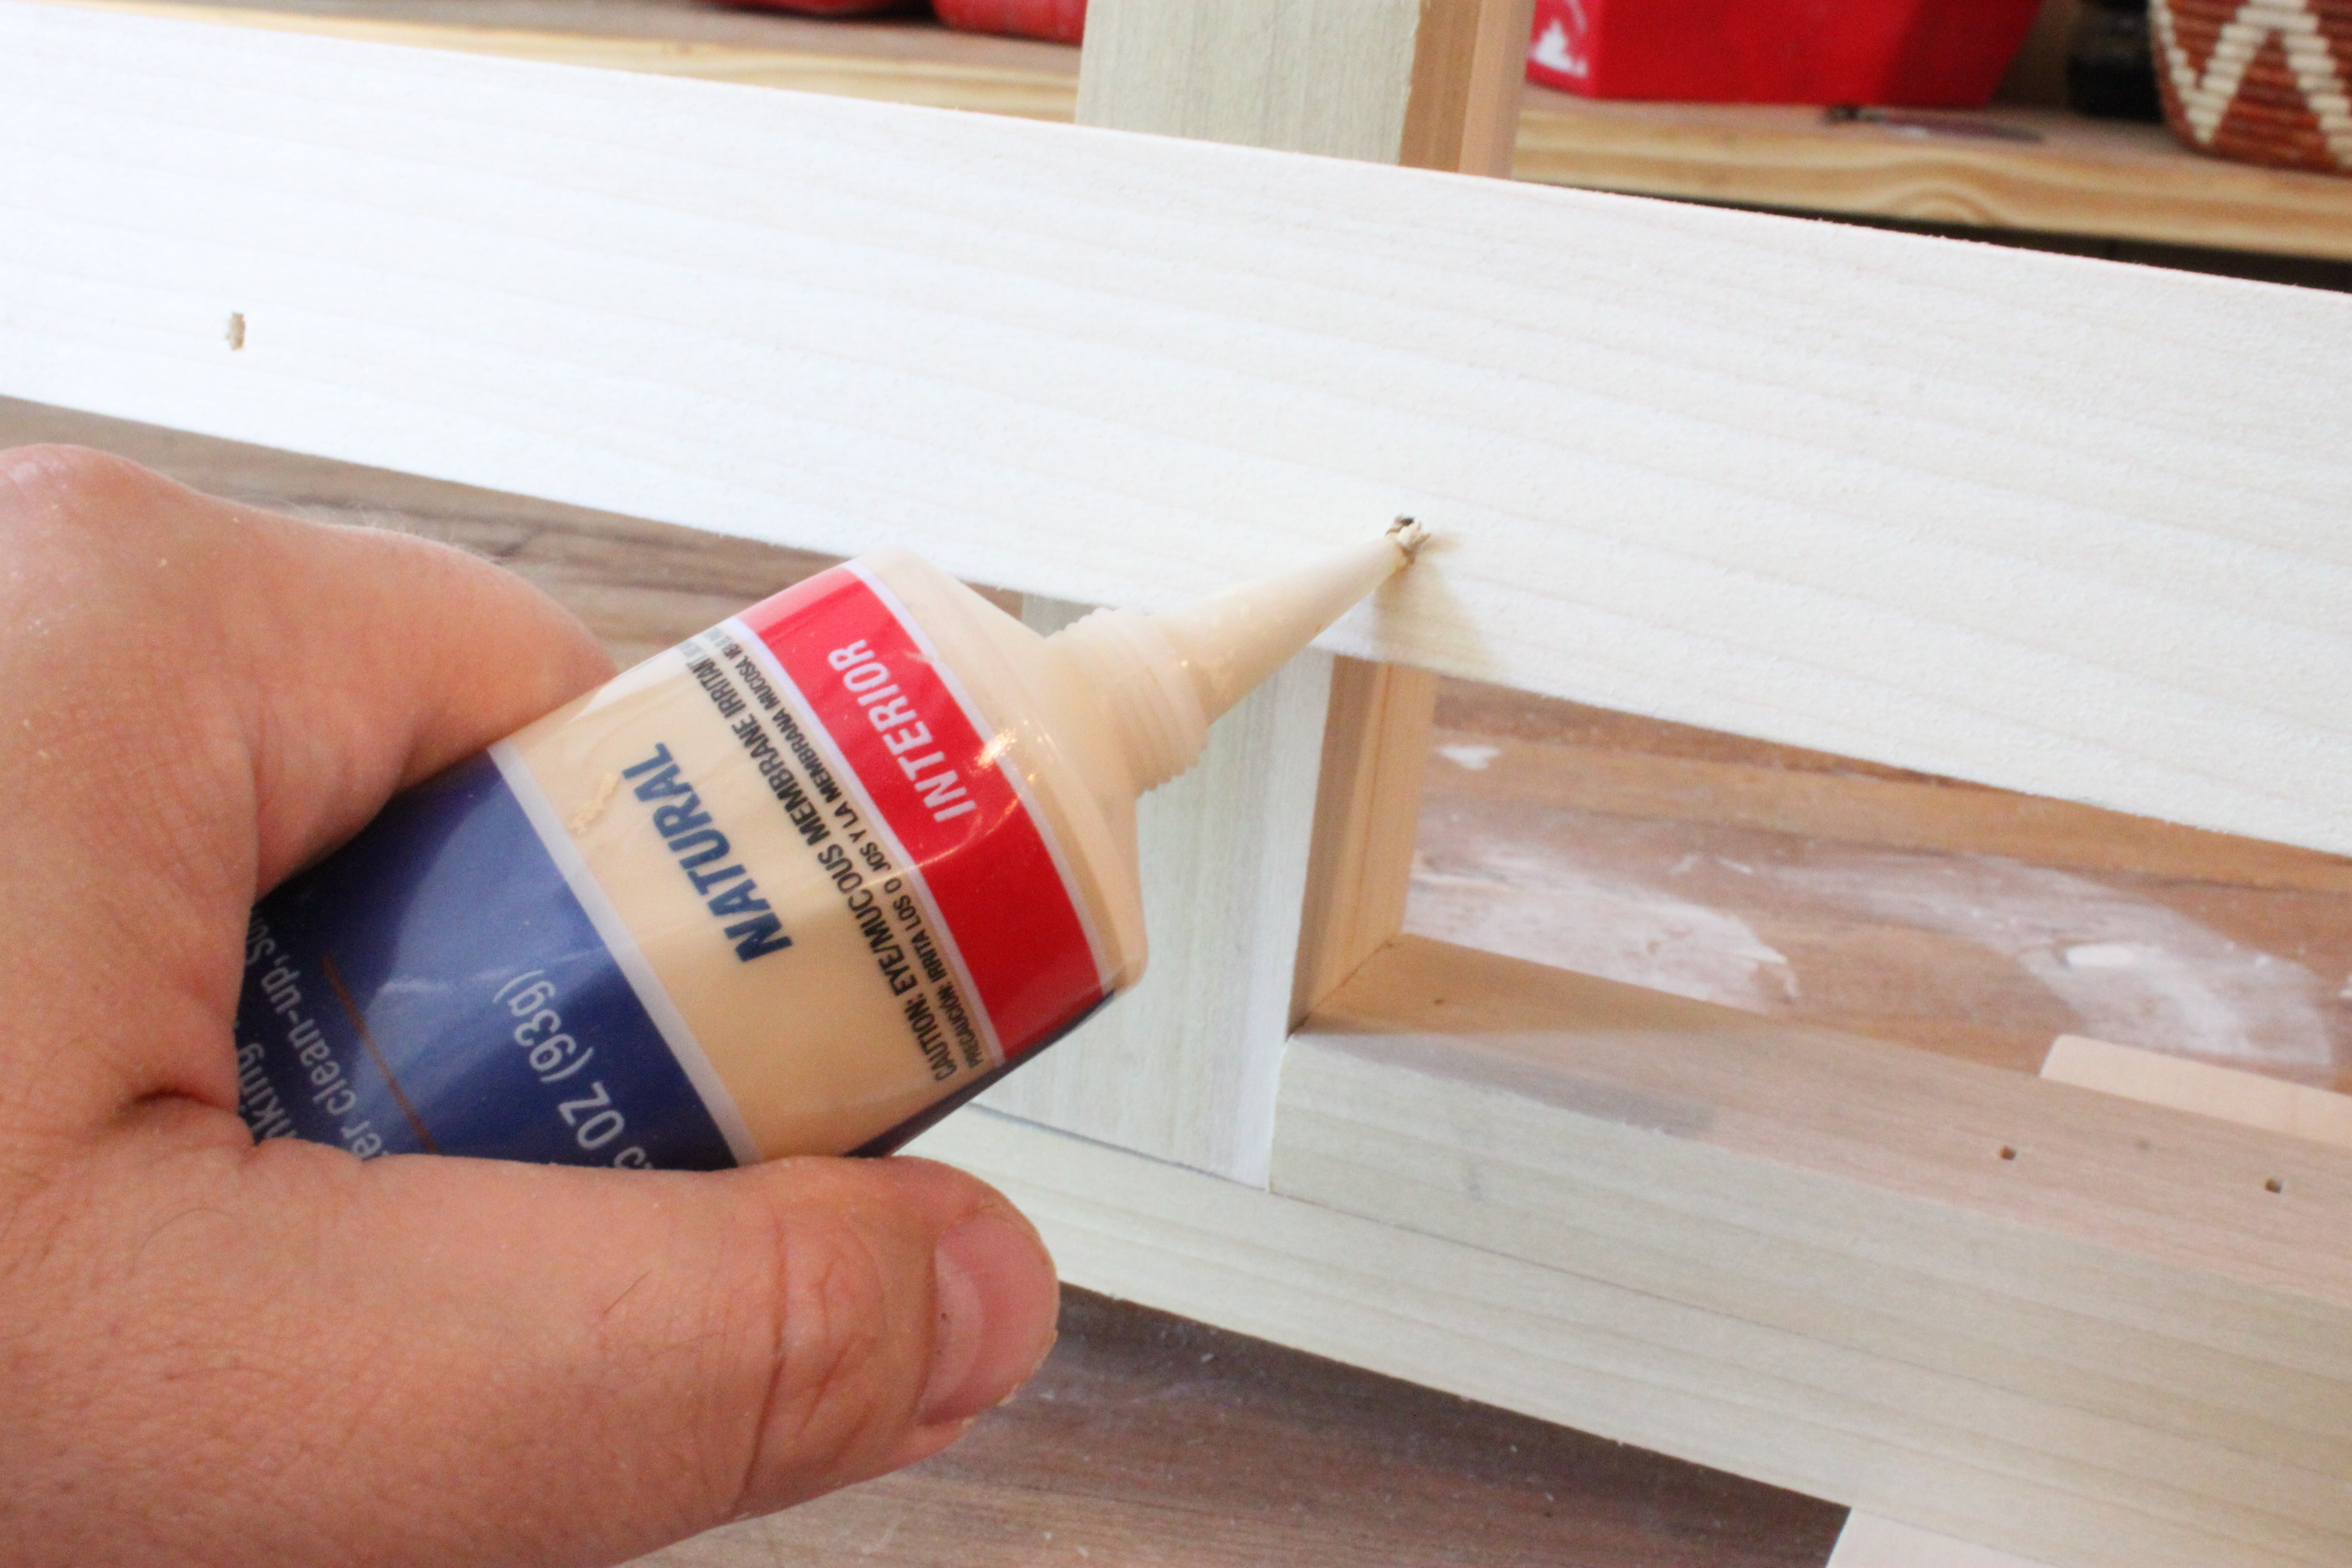 hardwood floor seam filler of wood floor wood floor hole filler intended for images of wood floor hole filler